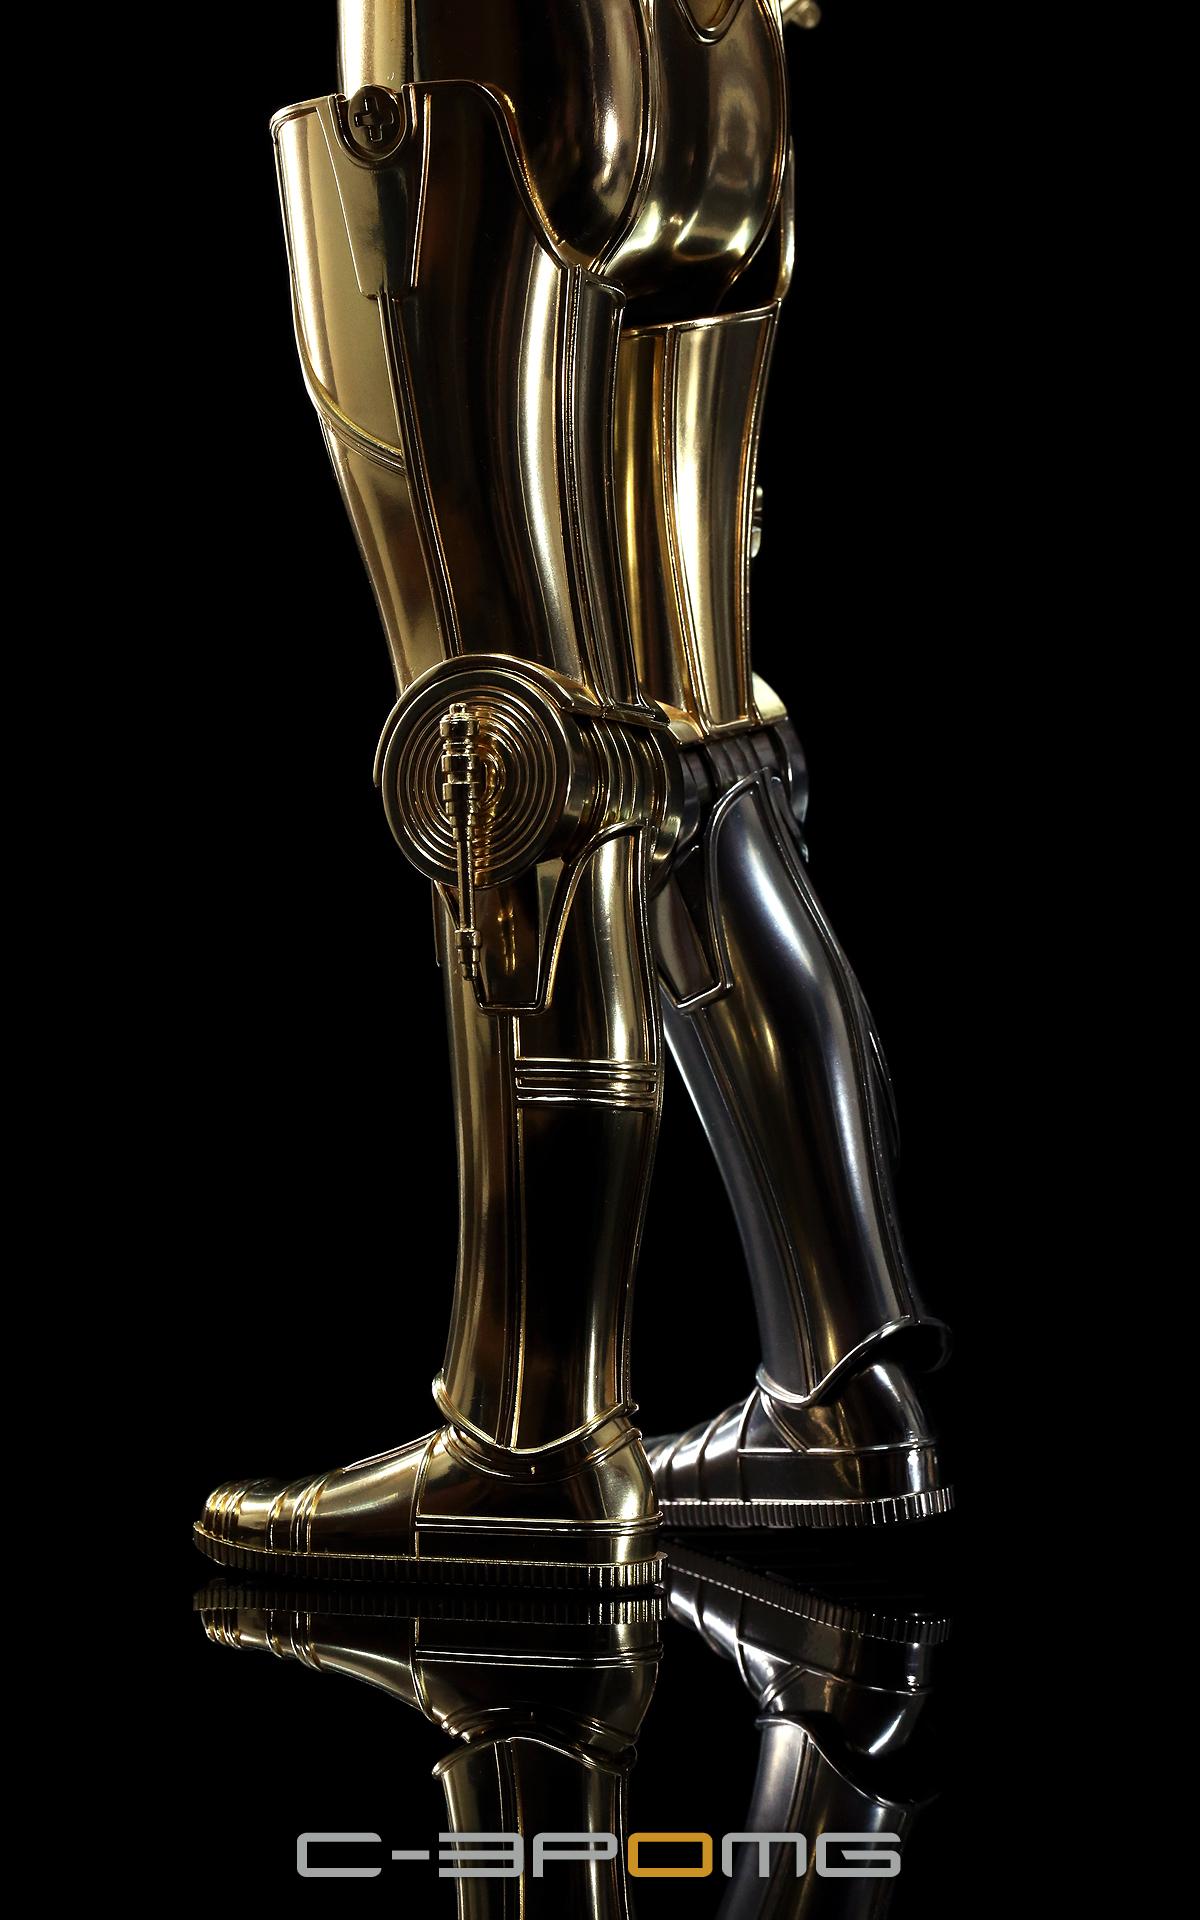 [Bandai] Star Wars: C-3PO - Perfect Model 1/6 scale - LANÇADO!!! - Página 2 C-3PO1138_zps9970a6d1